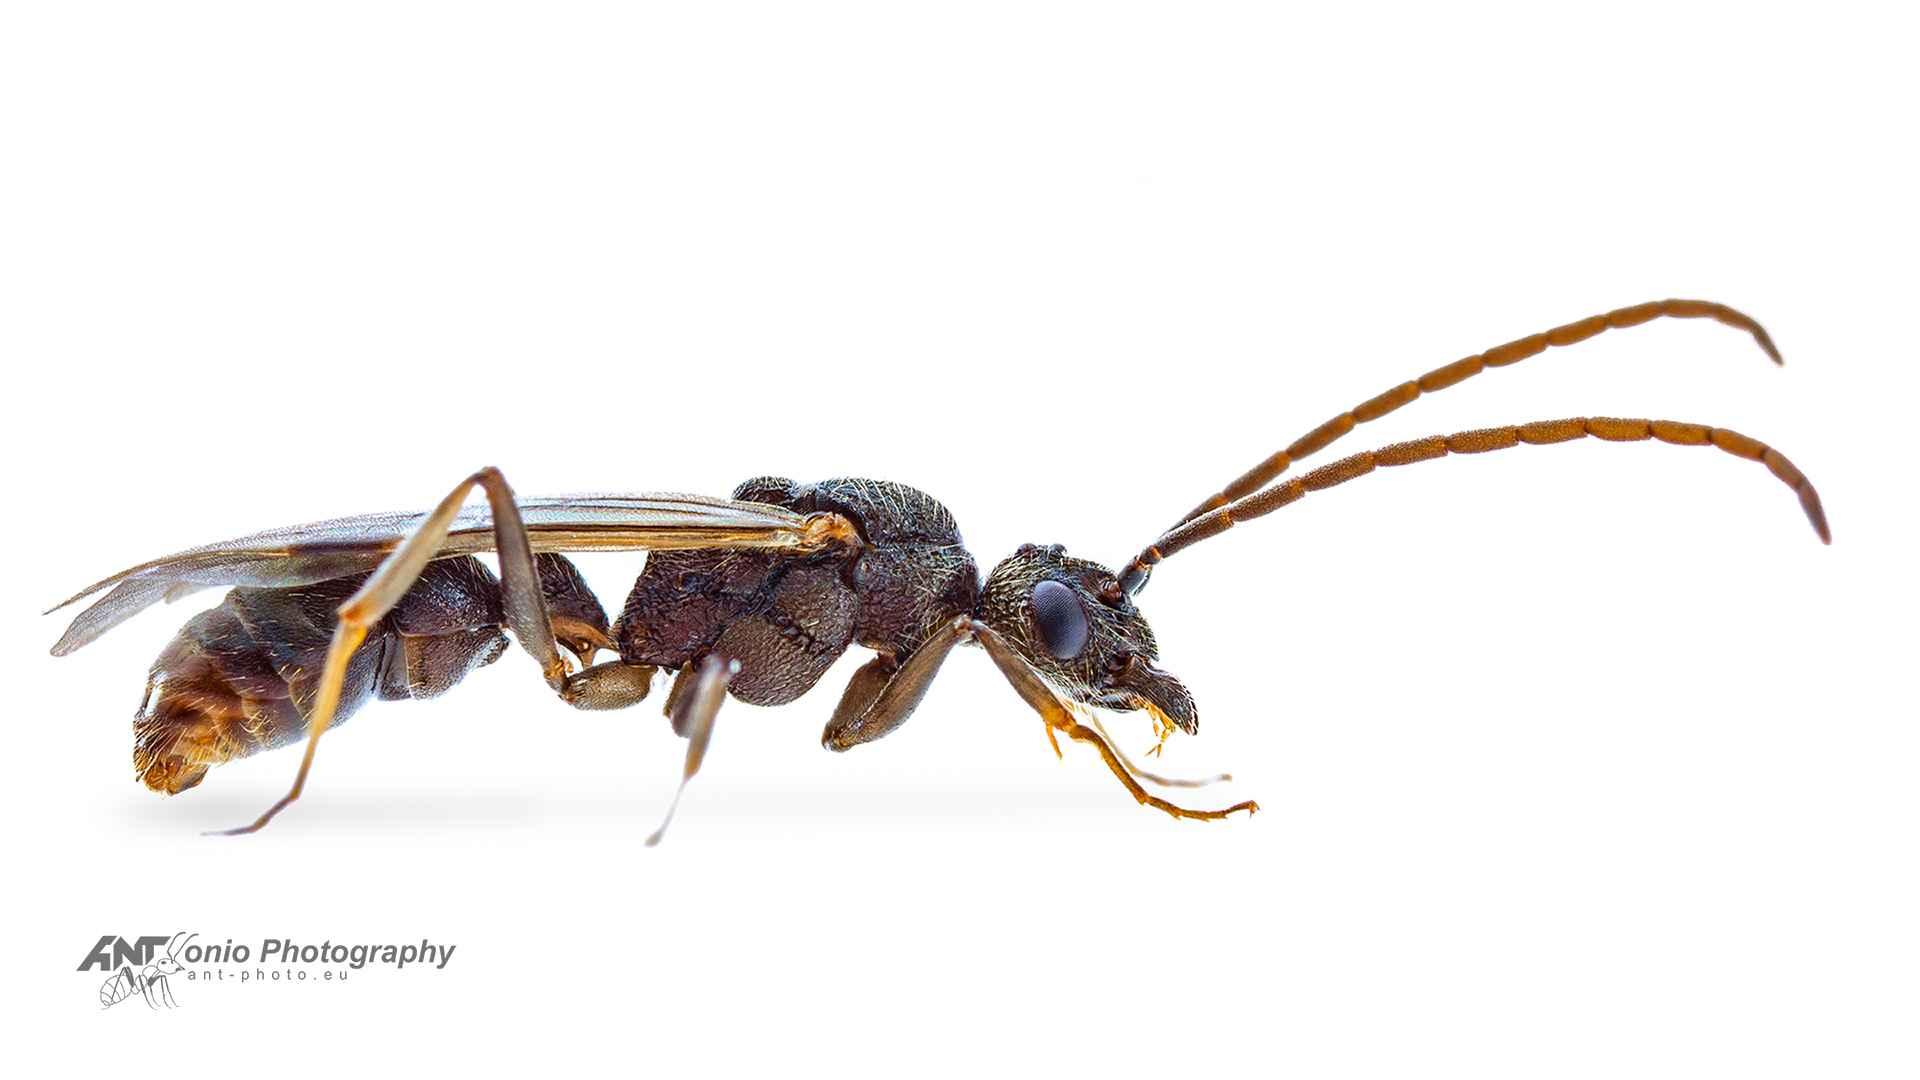 Ant Rhytidoponera metallica male